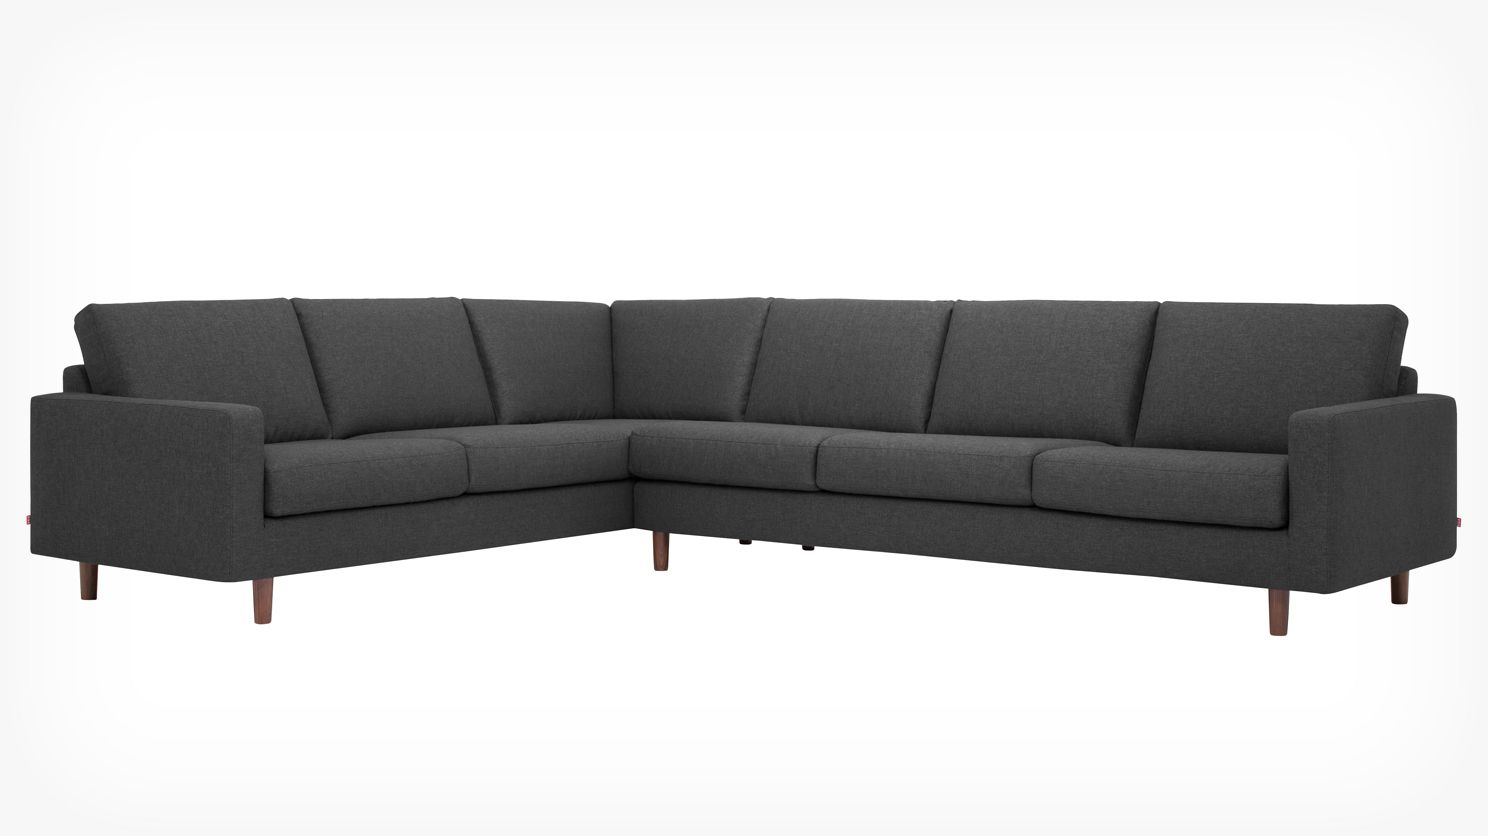 Oskar 2 Piece Sectional Sofa Fabric Eq3 Modern